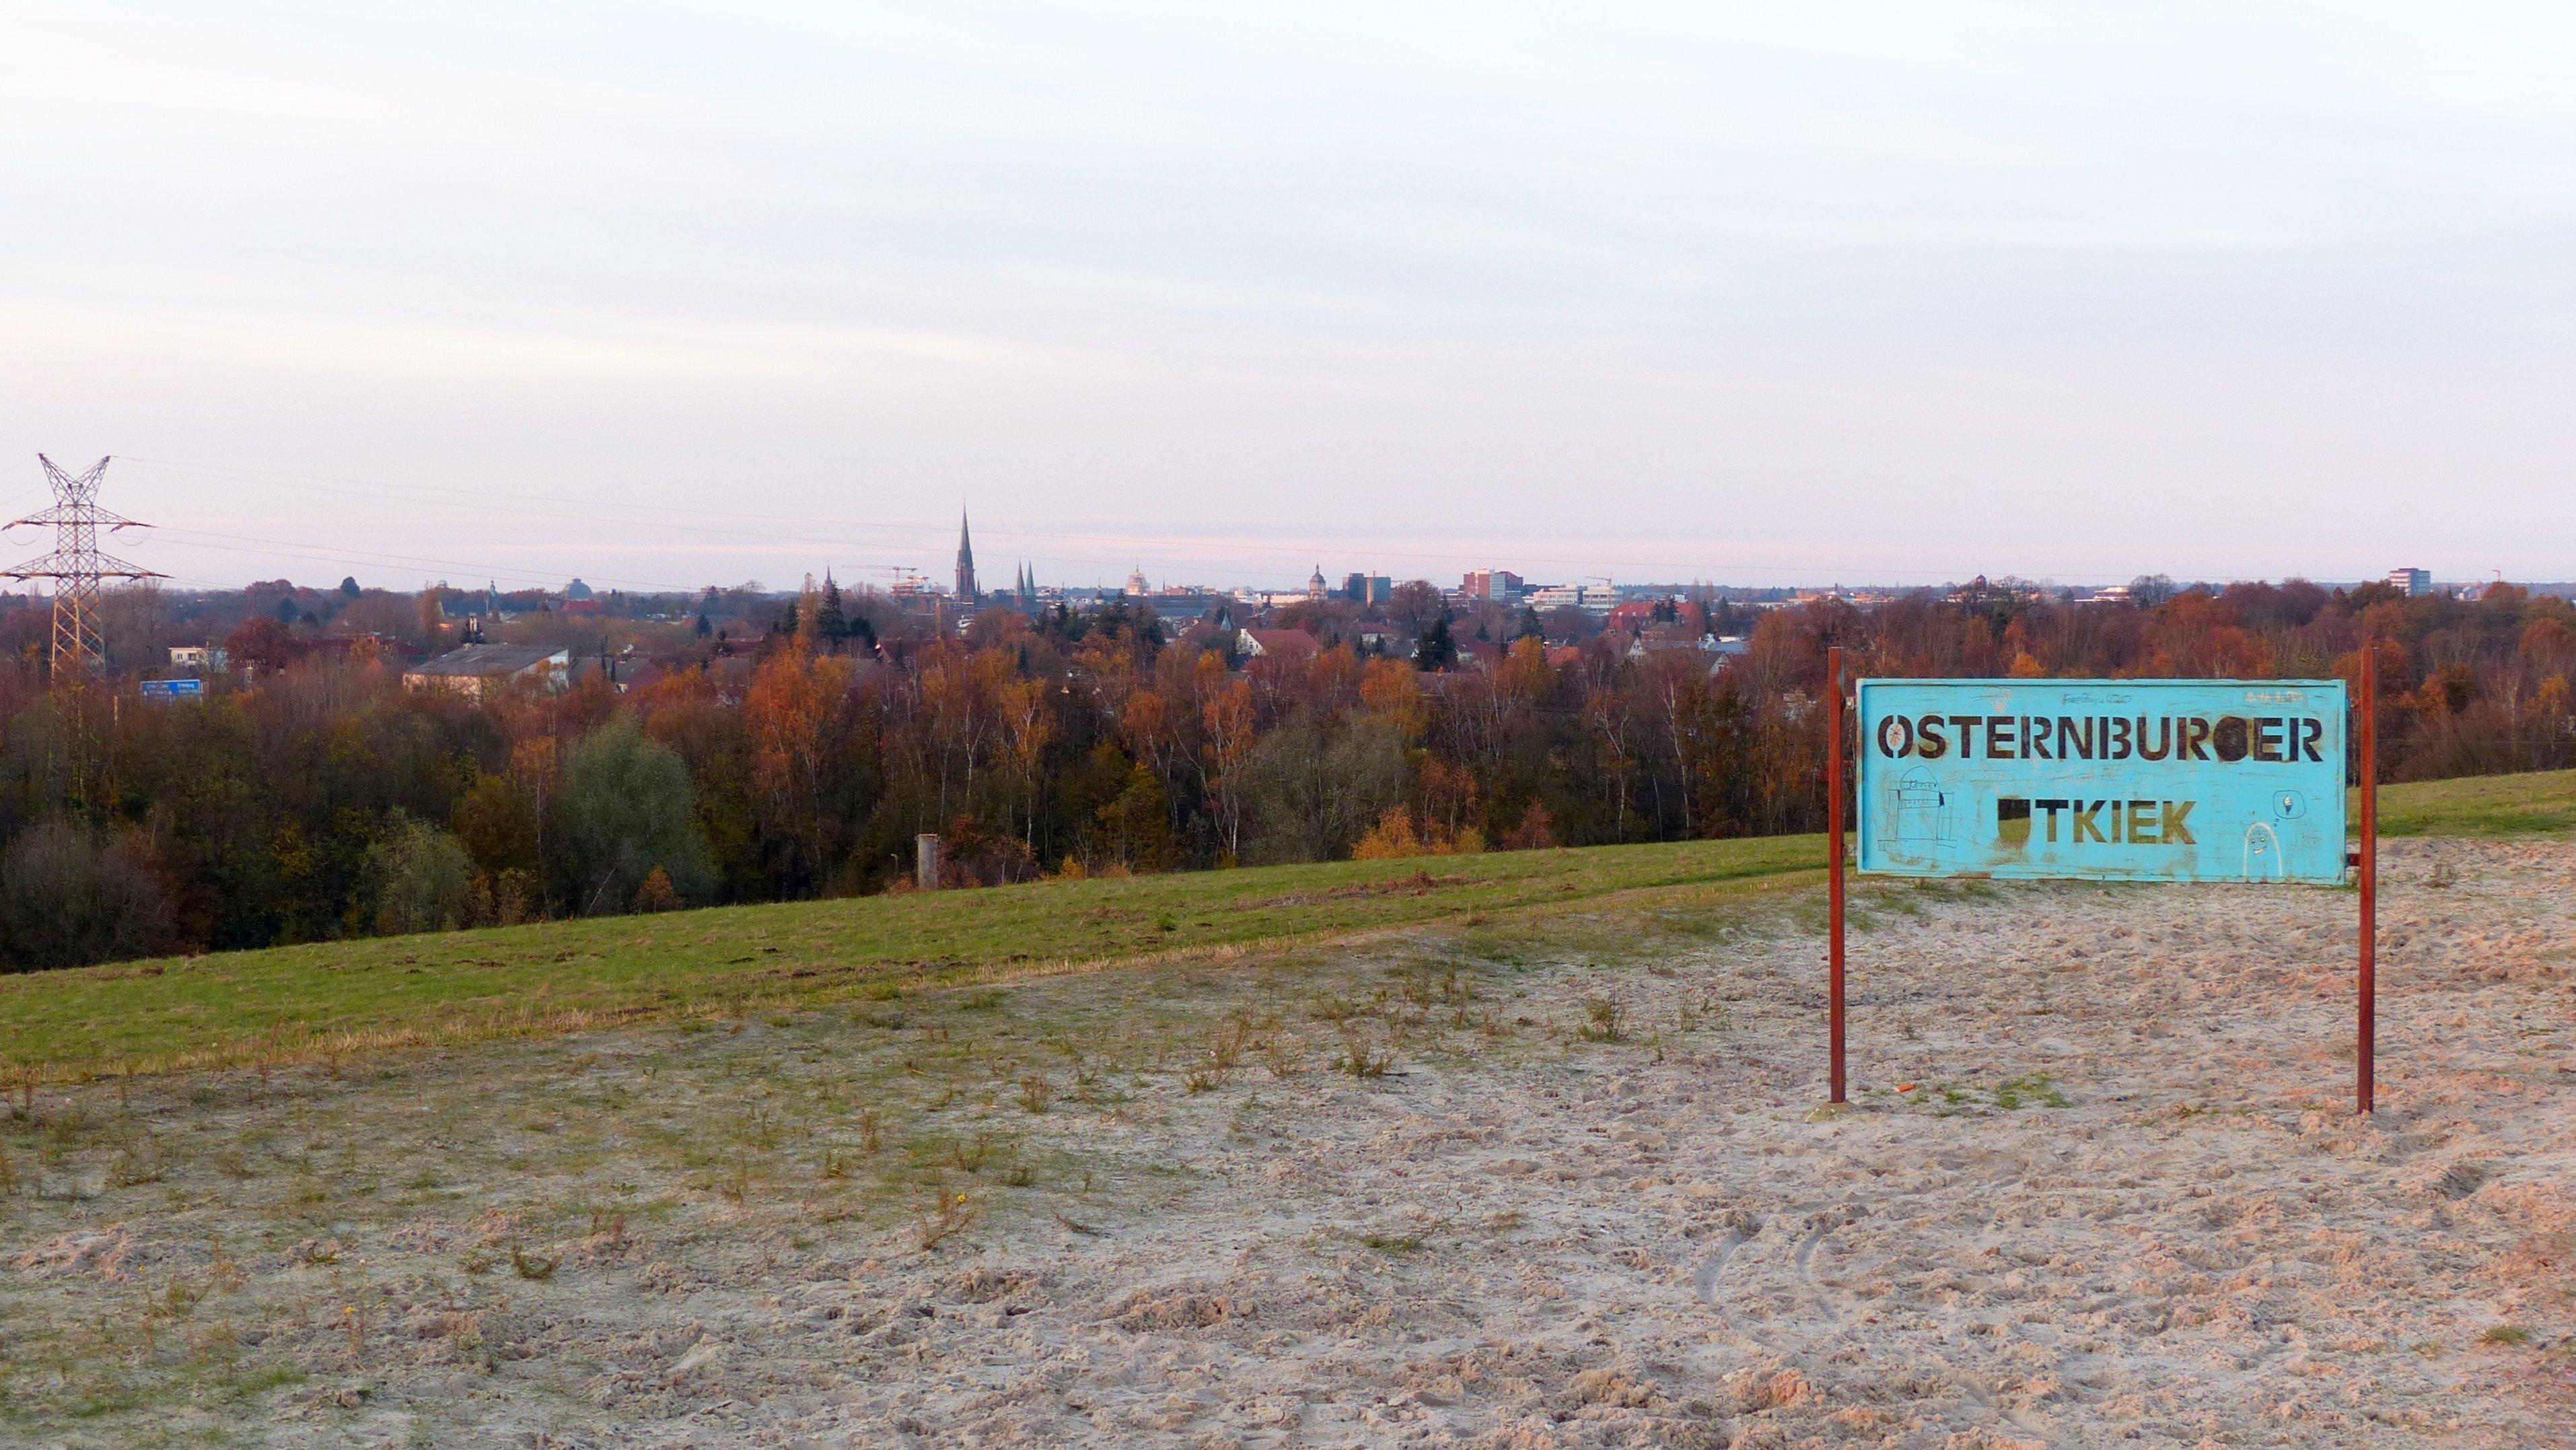 Mülldeponie oldenburg Recyclinghöfe Nord,